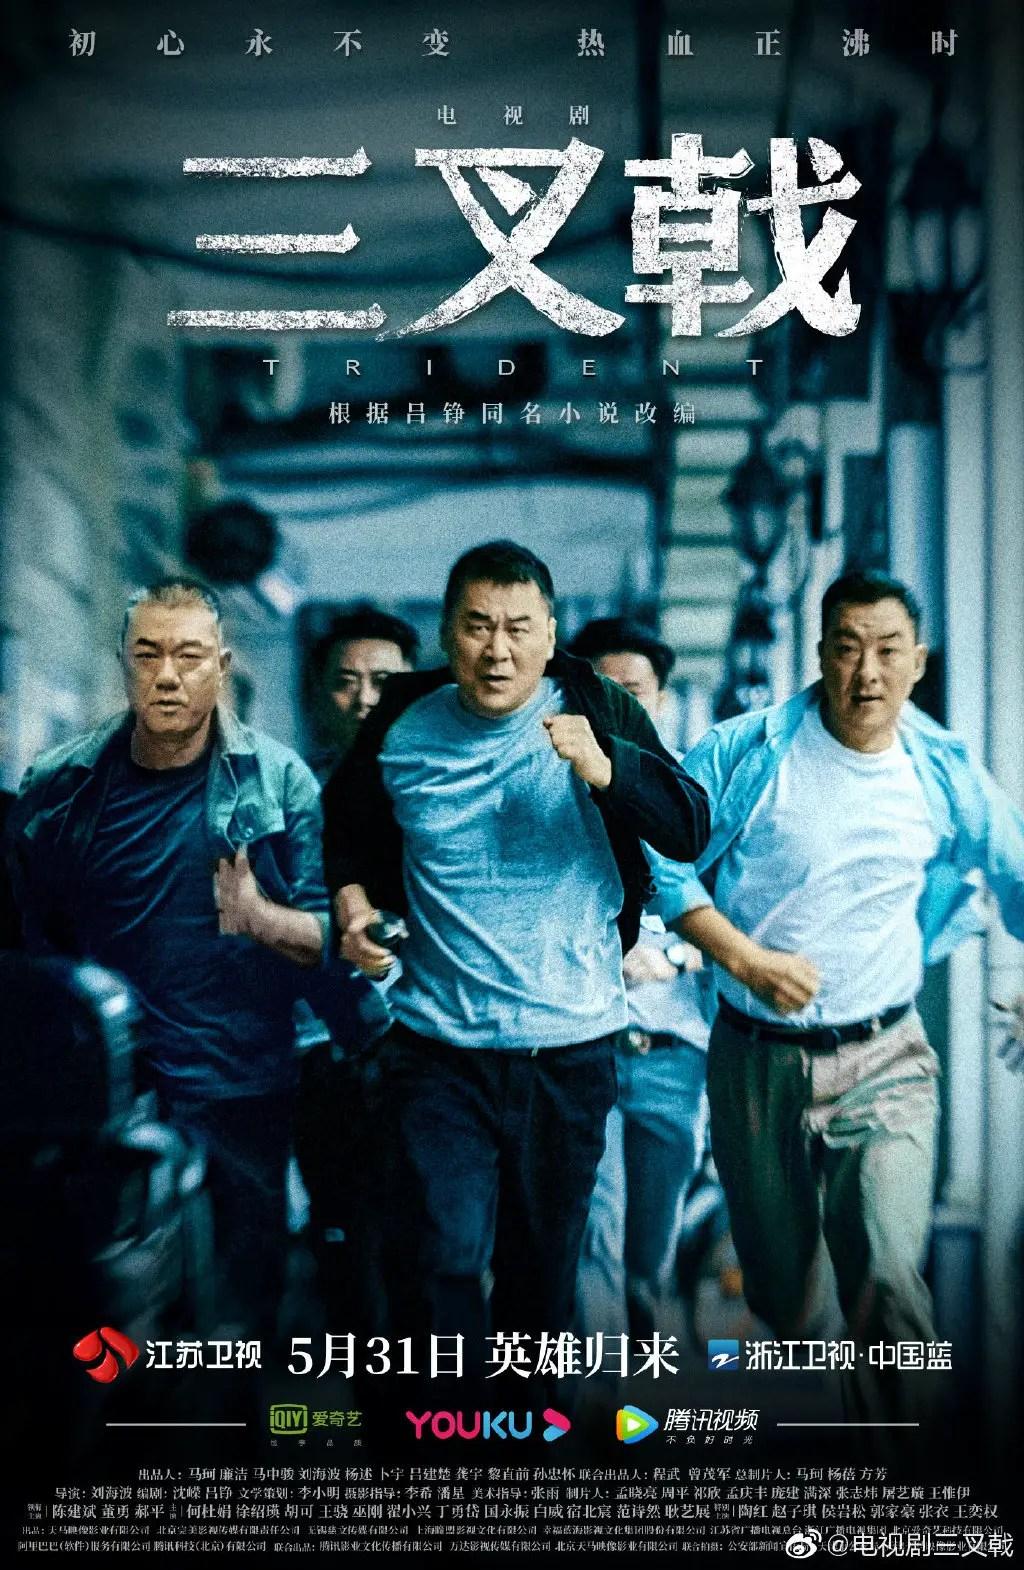 Trident Drama Poster